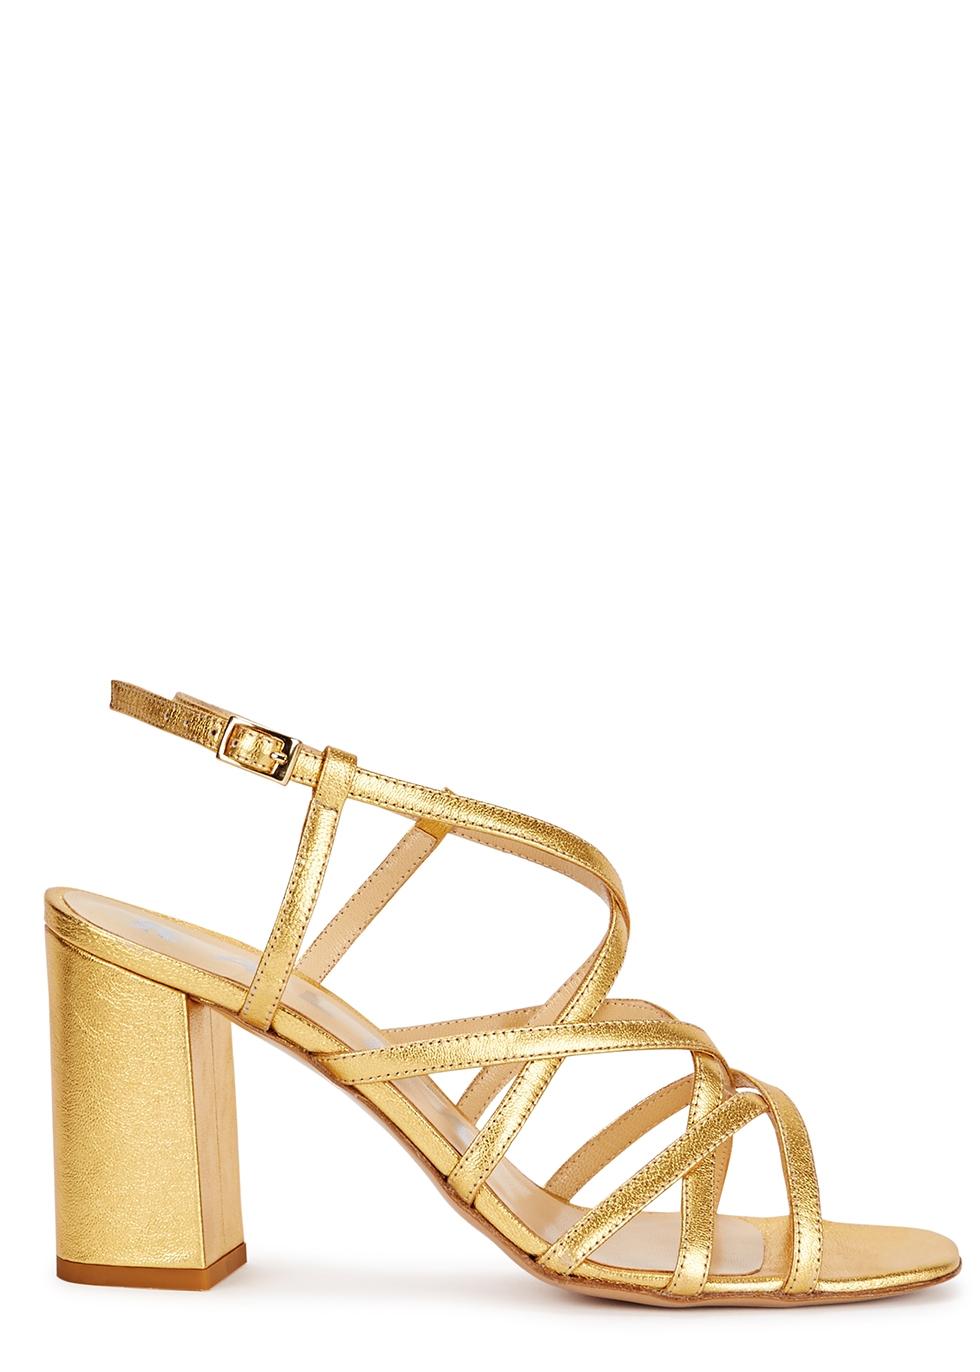 KALDA Pip Gold Leather Sandals